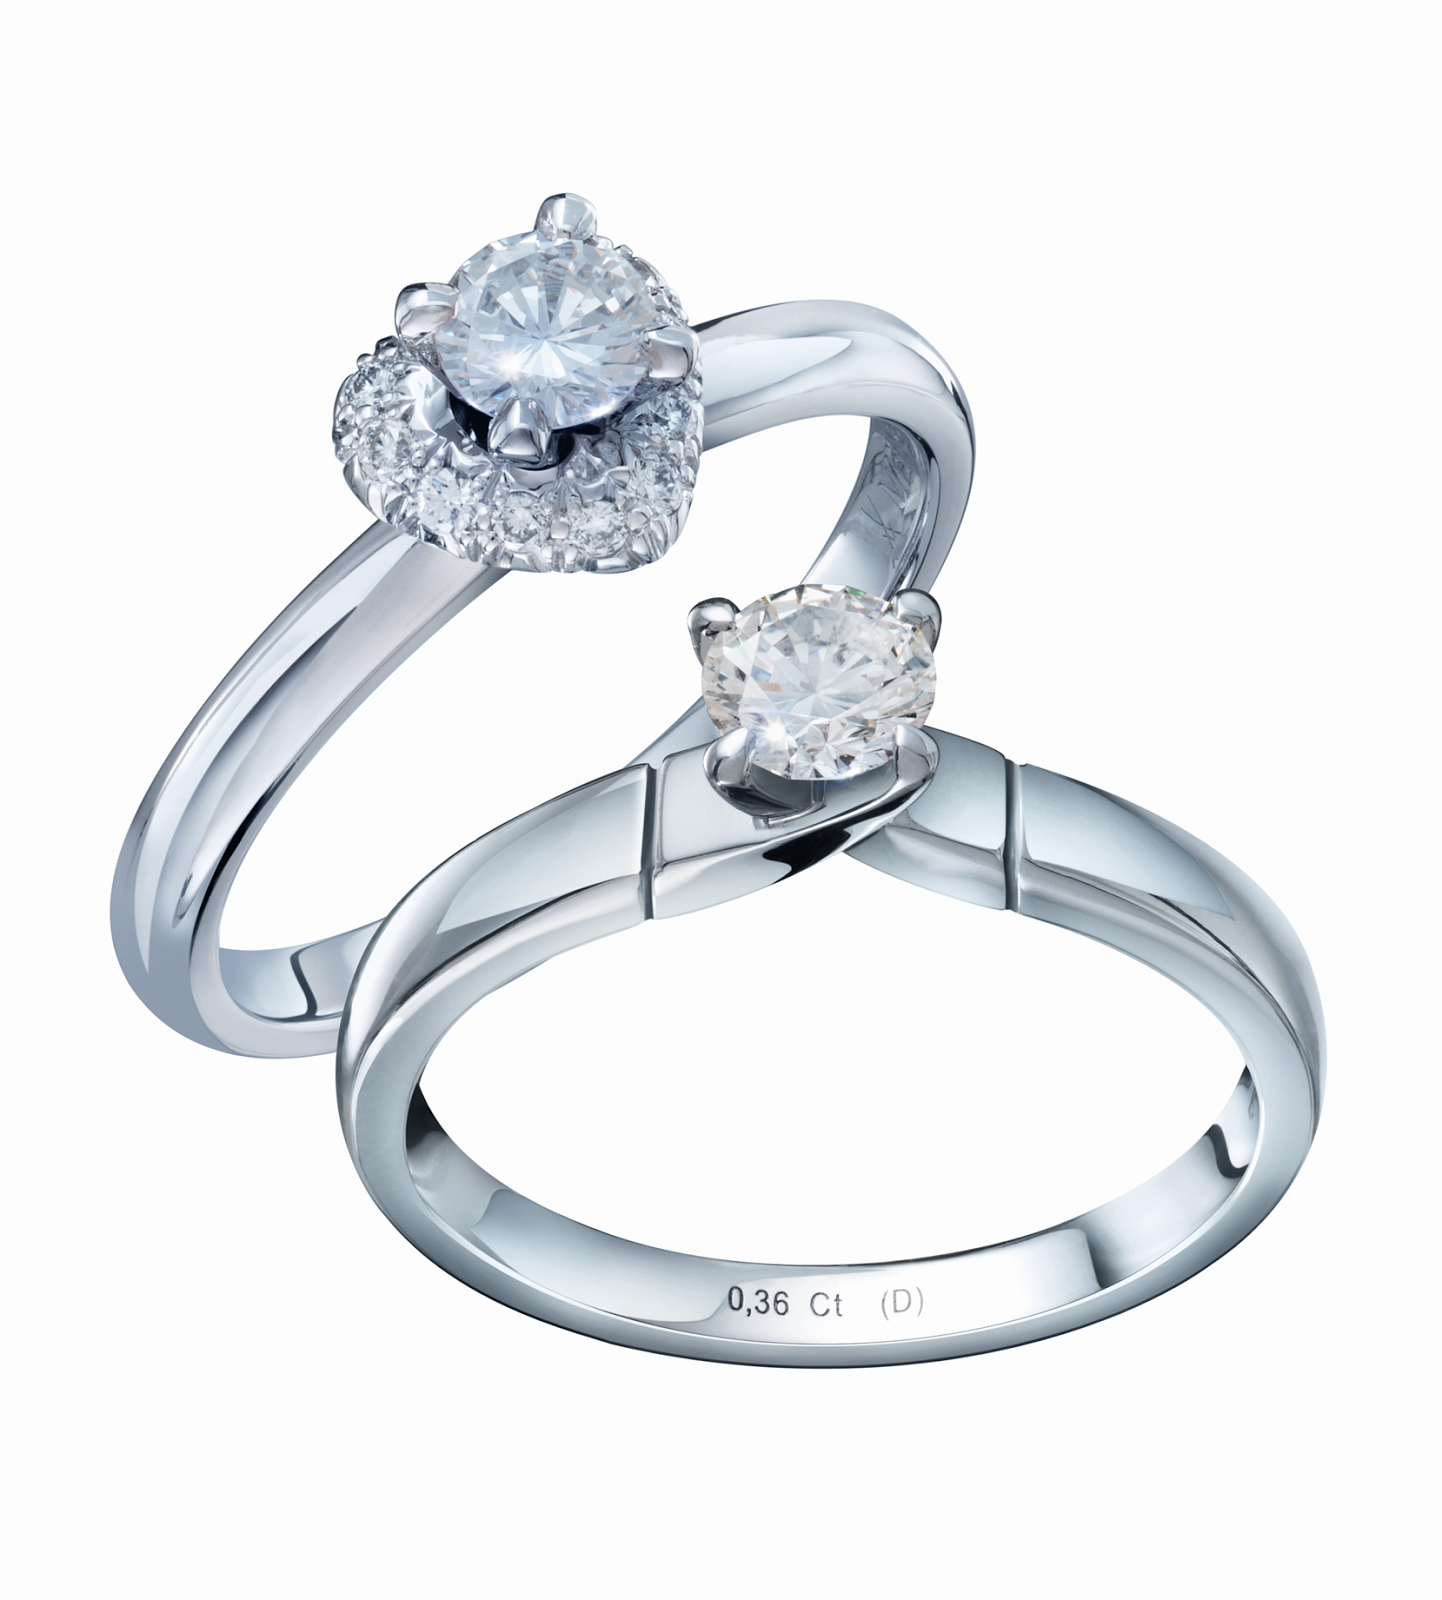 Jewelry News Network: Meissen Porcelain Jewelry Combines